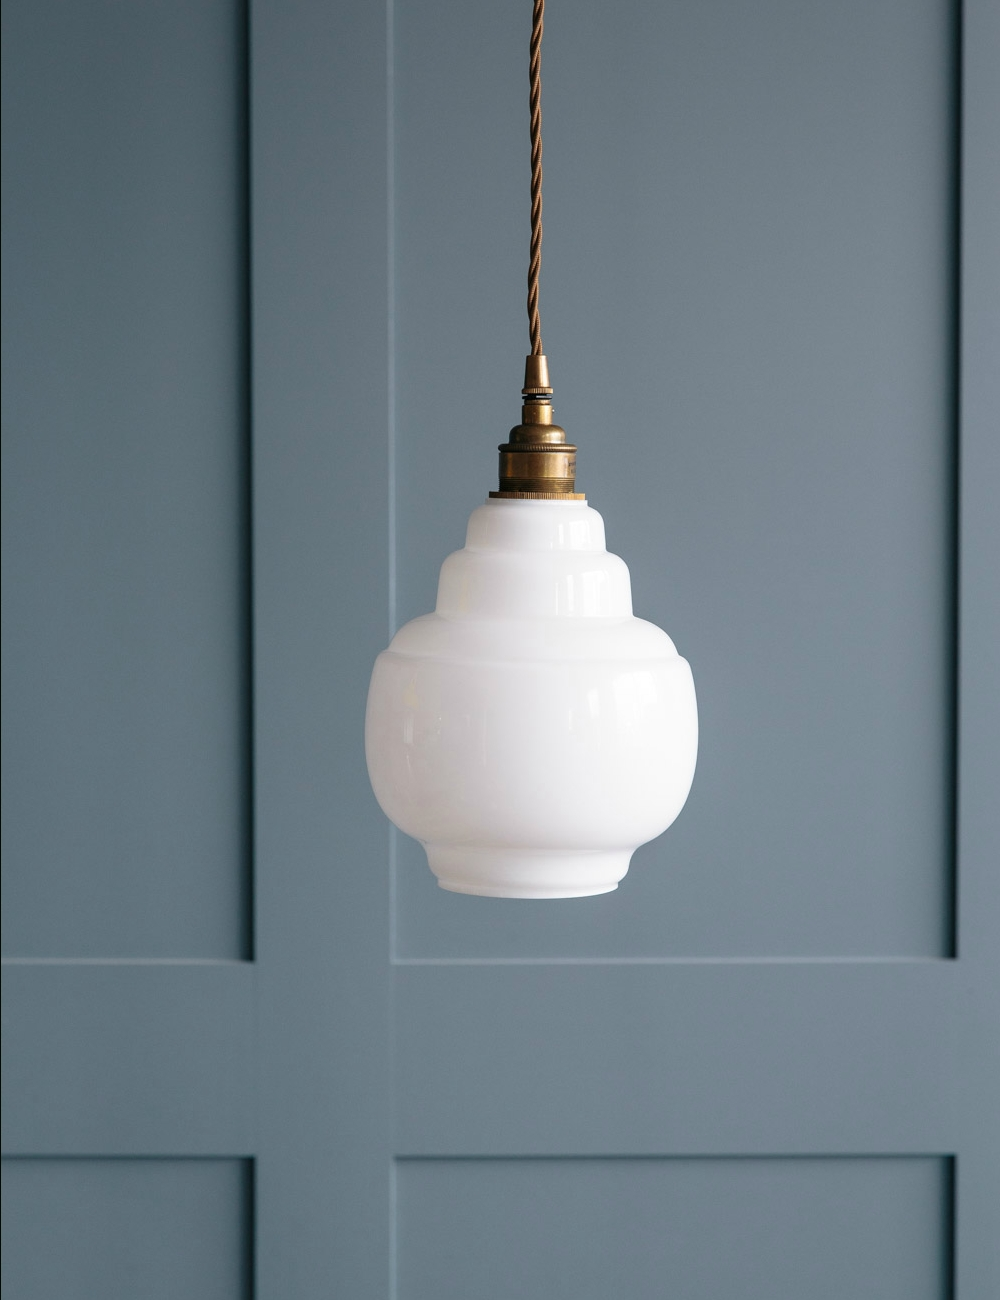 Opal Glass Pendant Light At Rose & Grey regarding Small Glass Pendant Lights (Image 7 of 15)